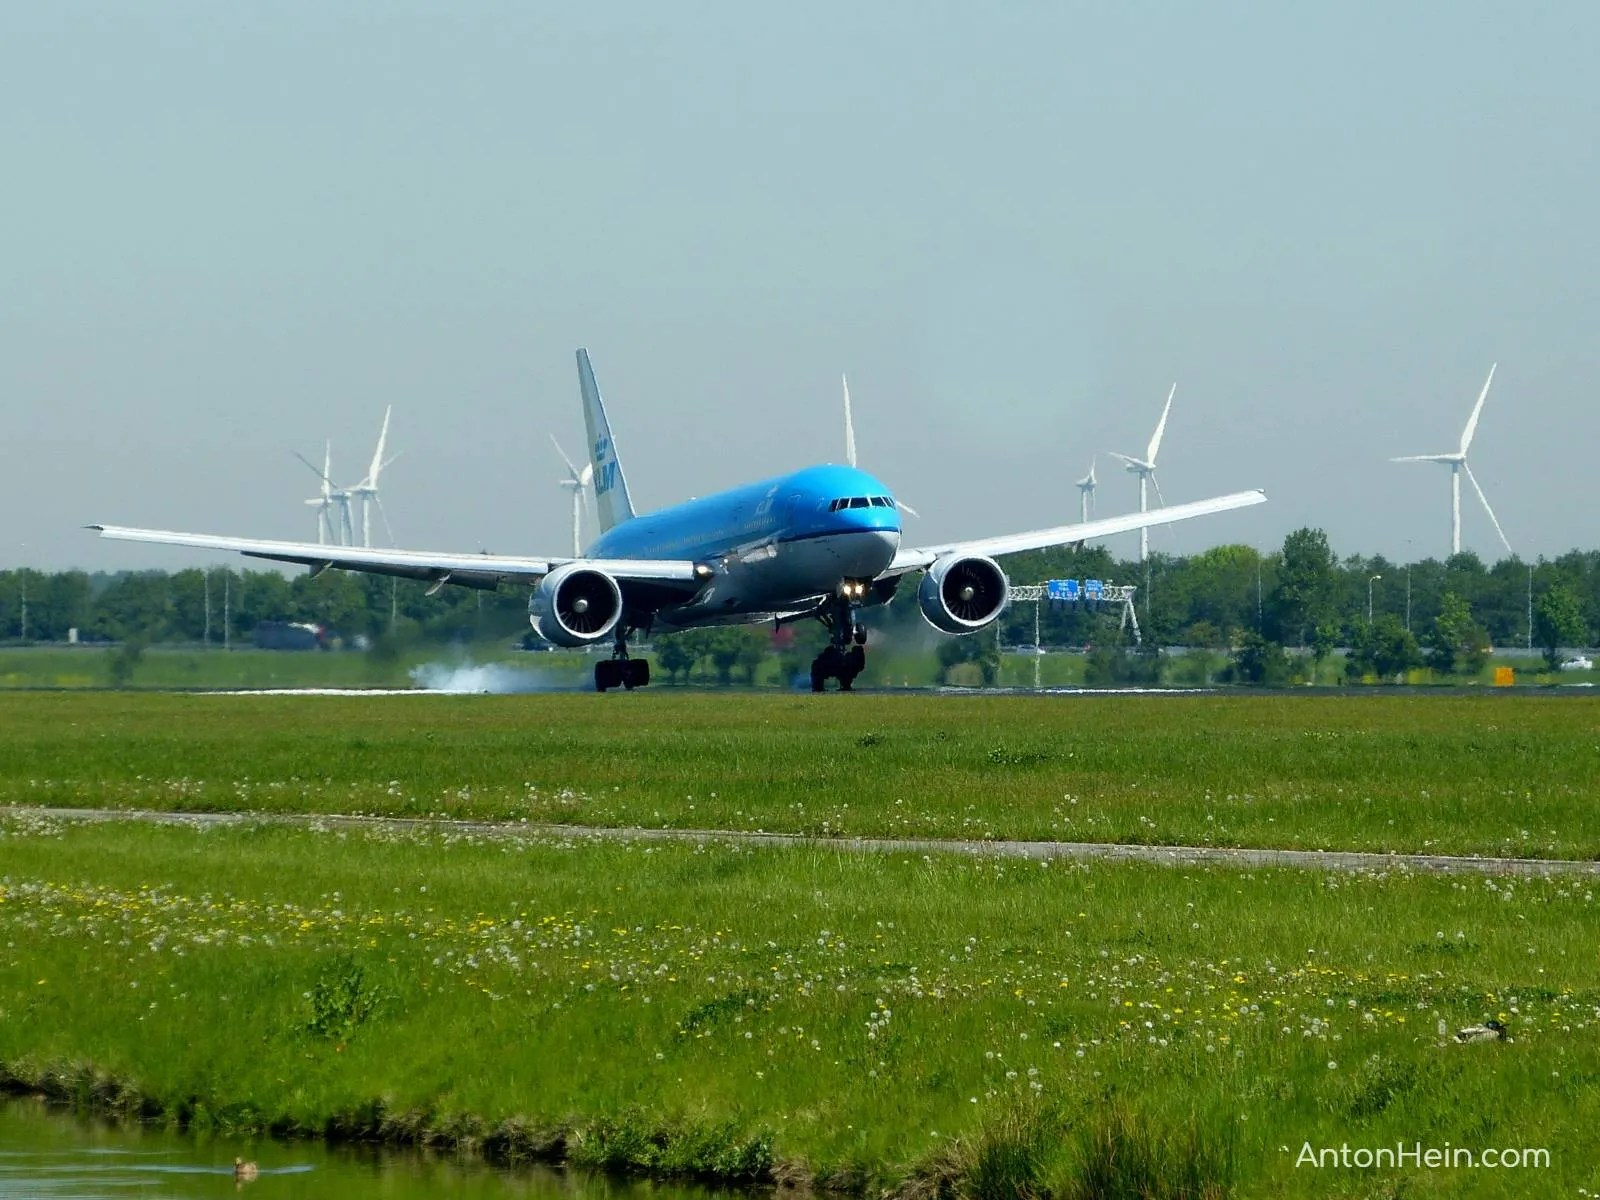 Amsterdam: airplane spotting at Schiphol